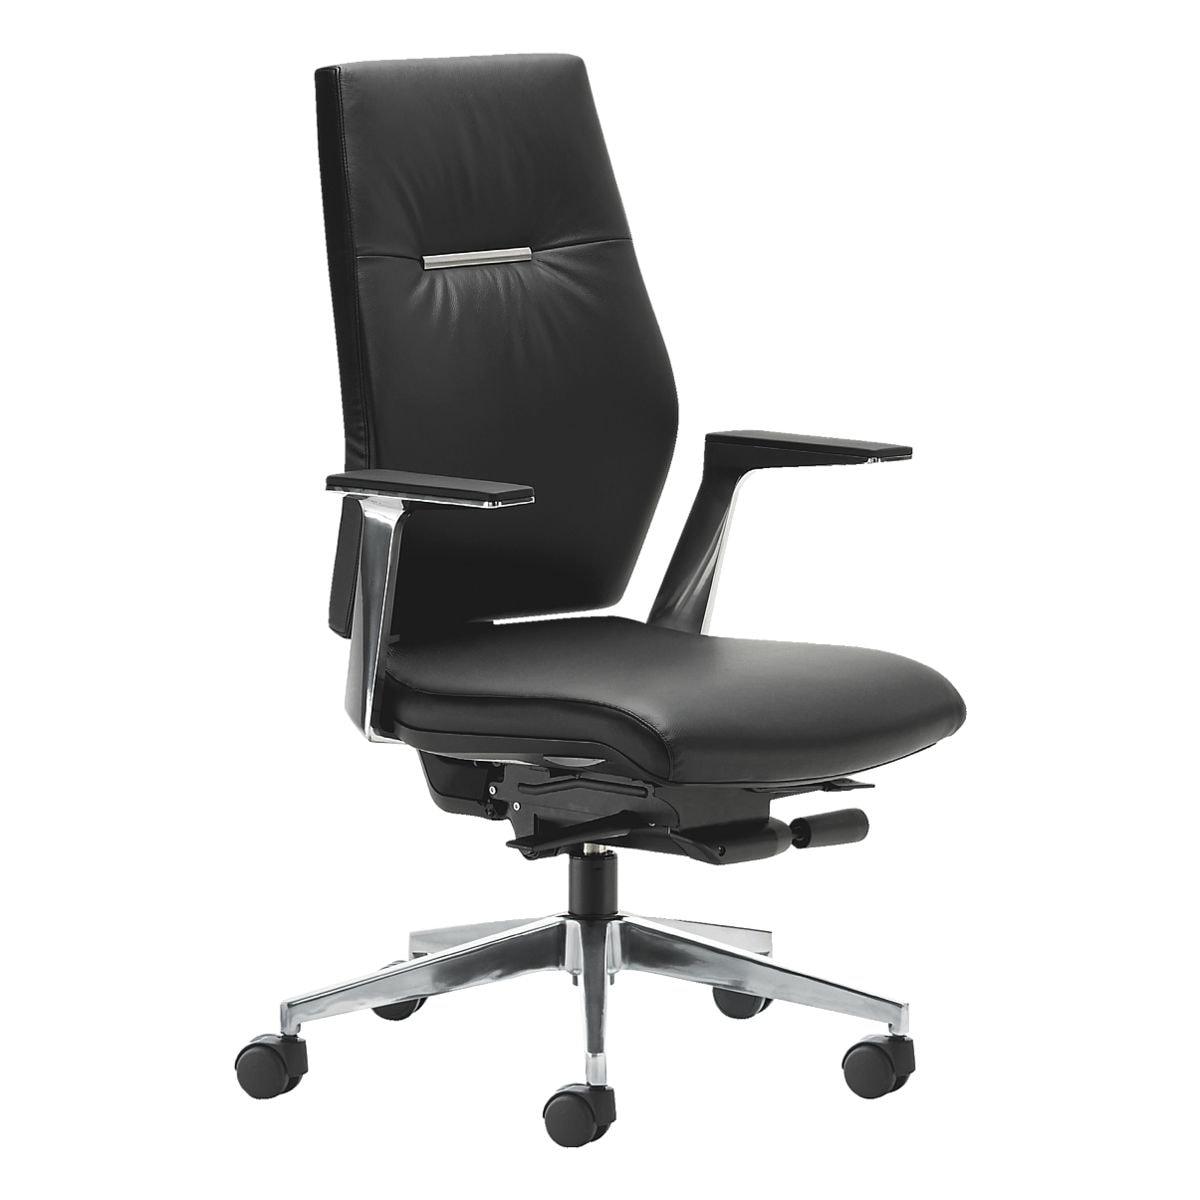 Bürostuhl mayer Sitzmöbel »my Sedna« mit Armlehnen